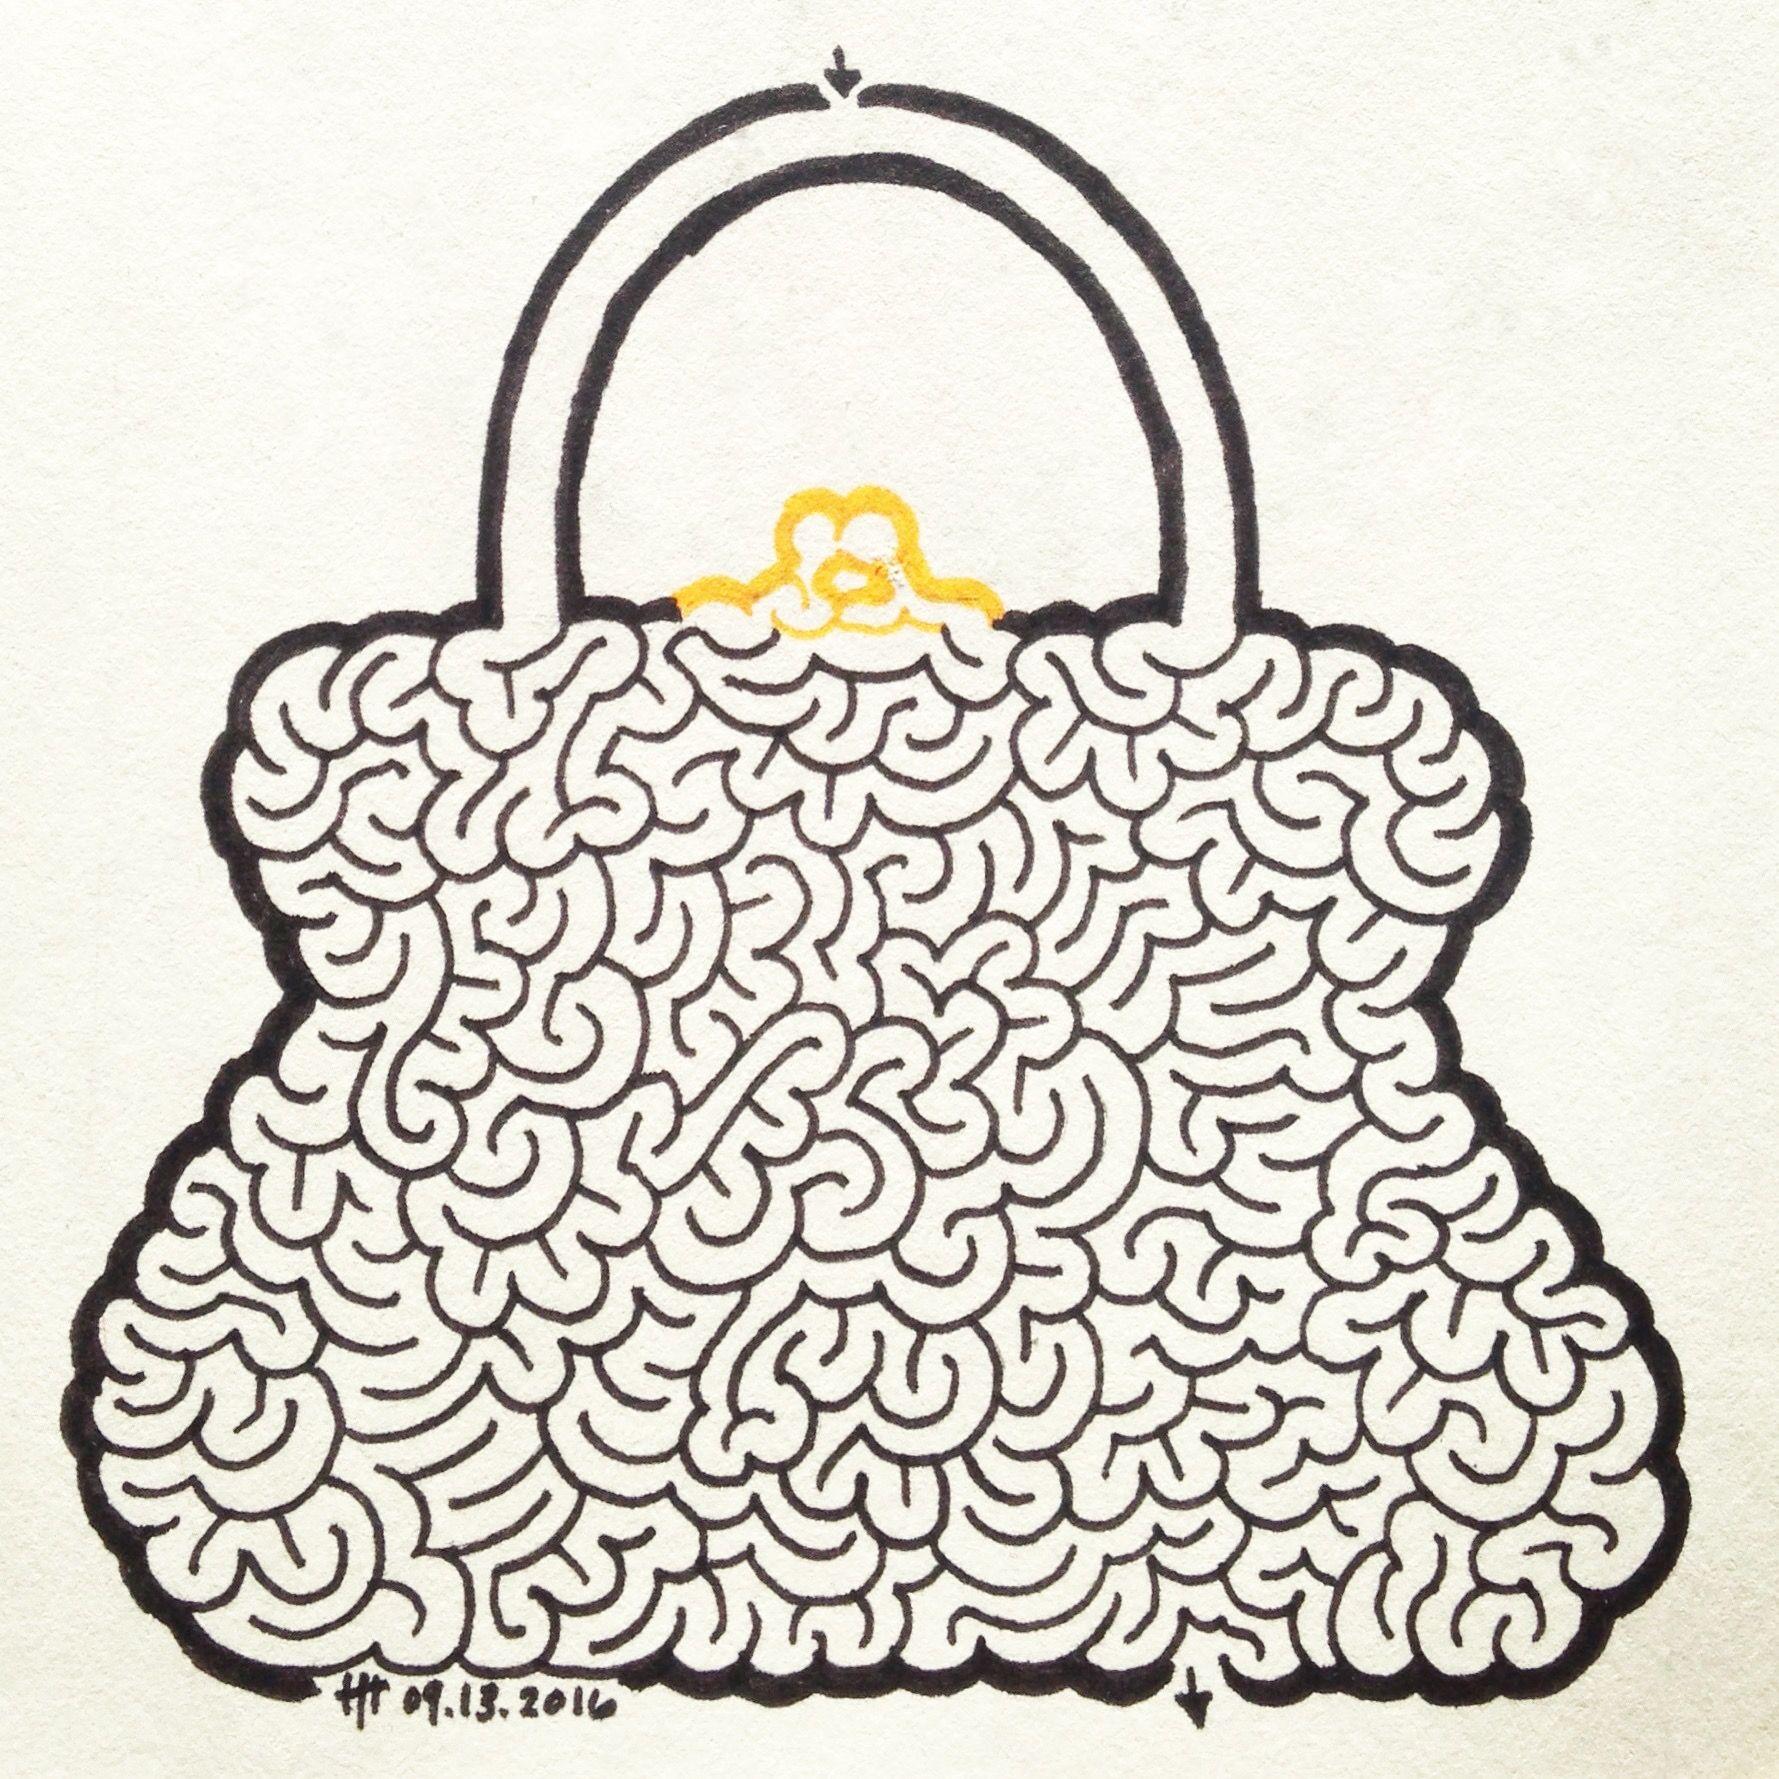 Lady Labyrinth Brain Maze Heather Hoesl Con Imagenes